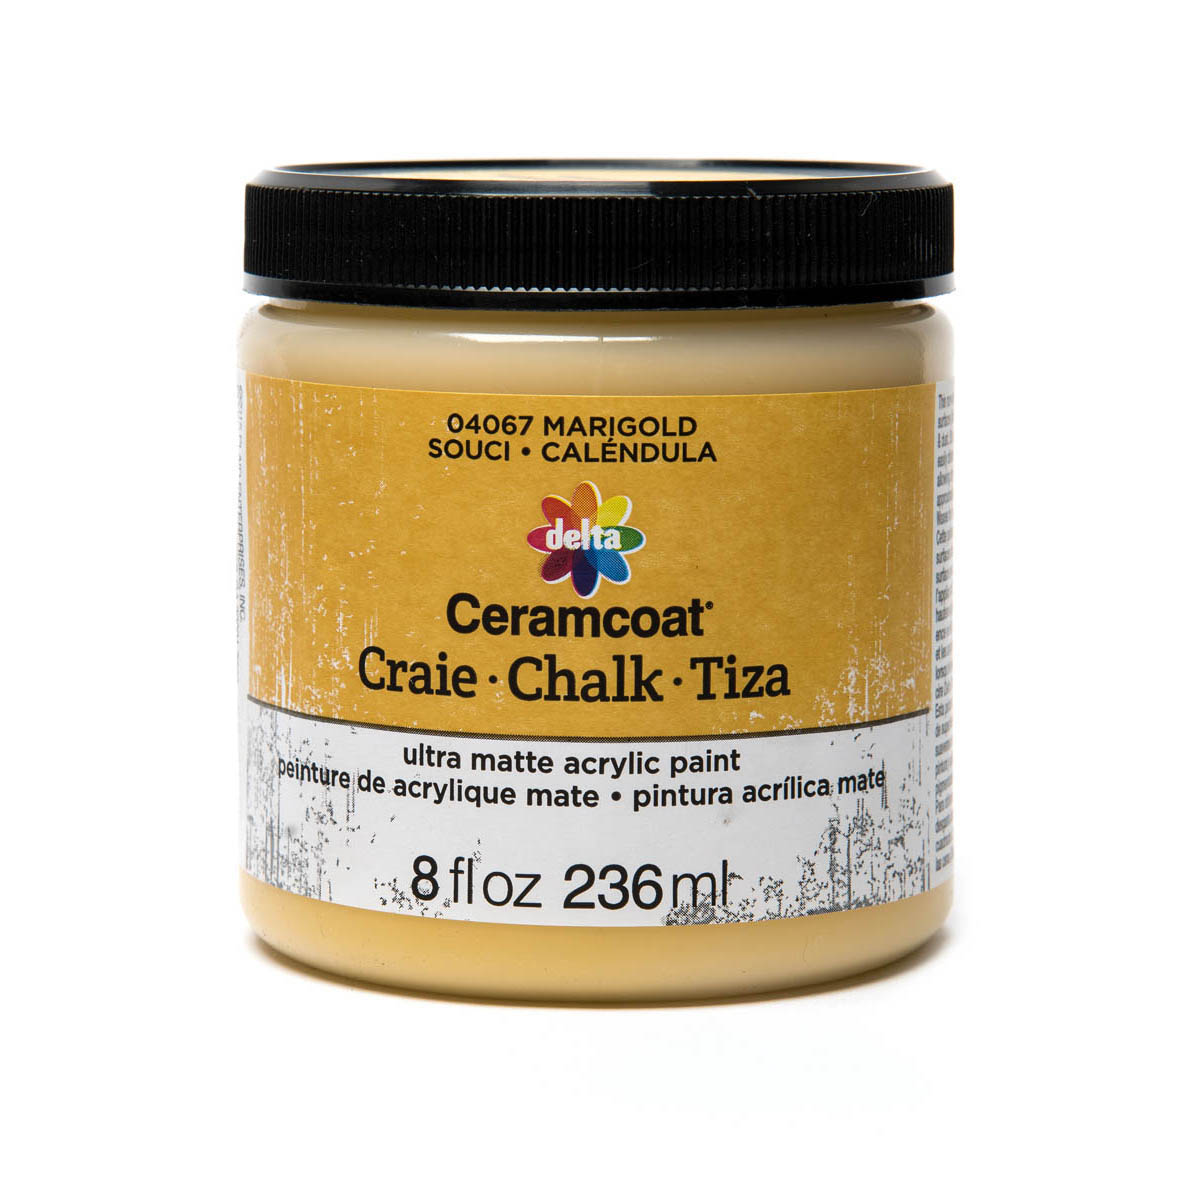 Delta Ceramcoat ® Chalk - Marigold, 8 oz. - 04067